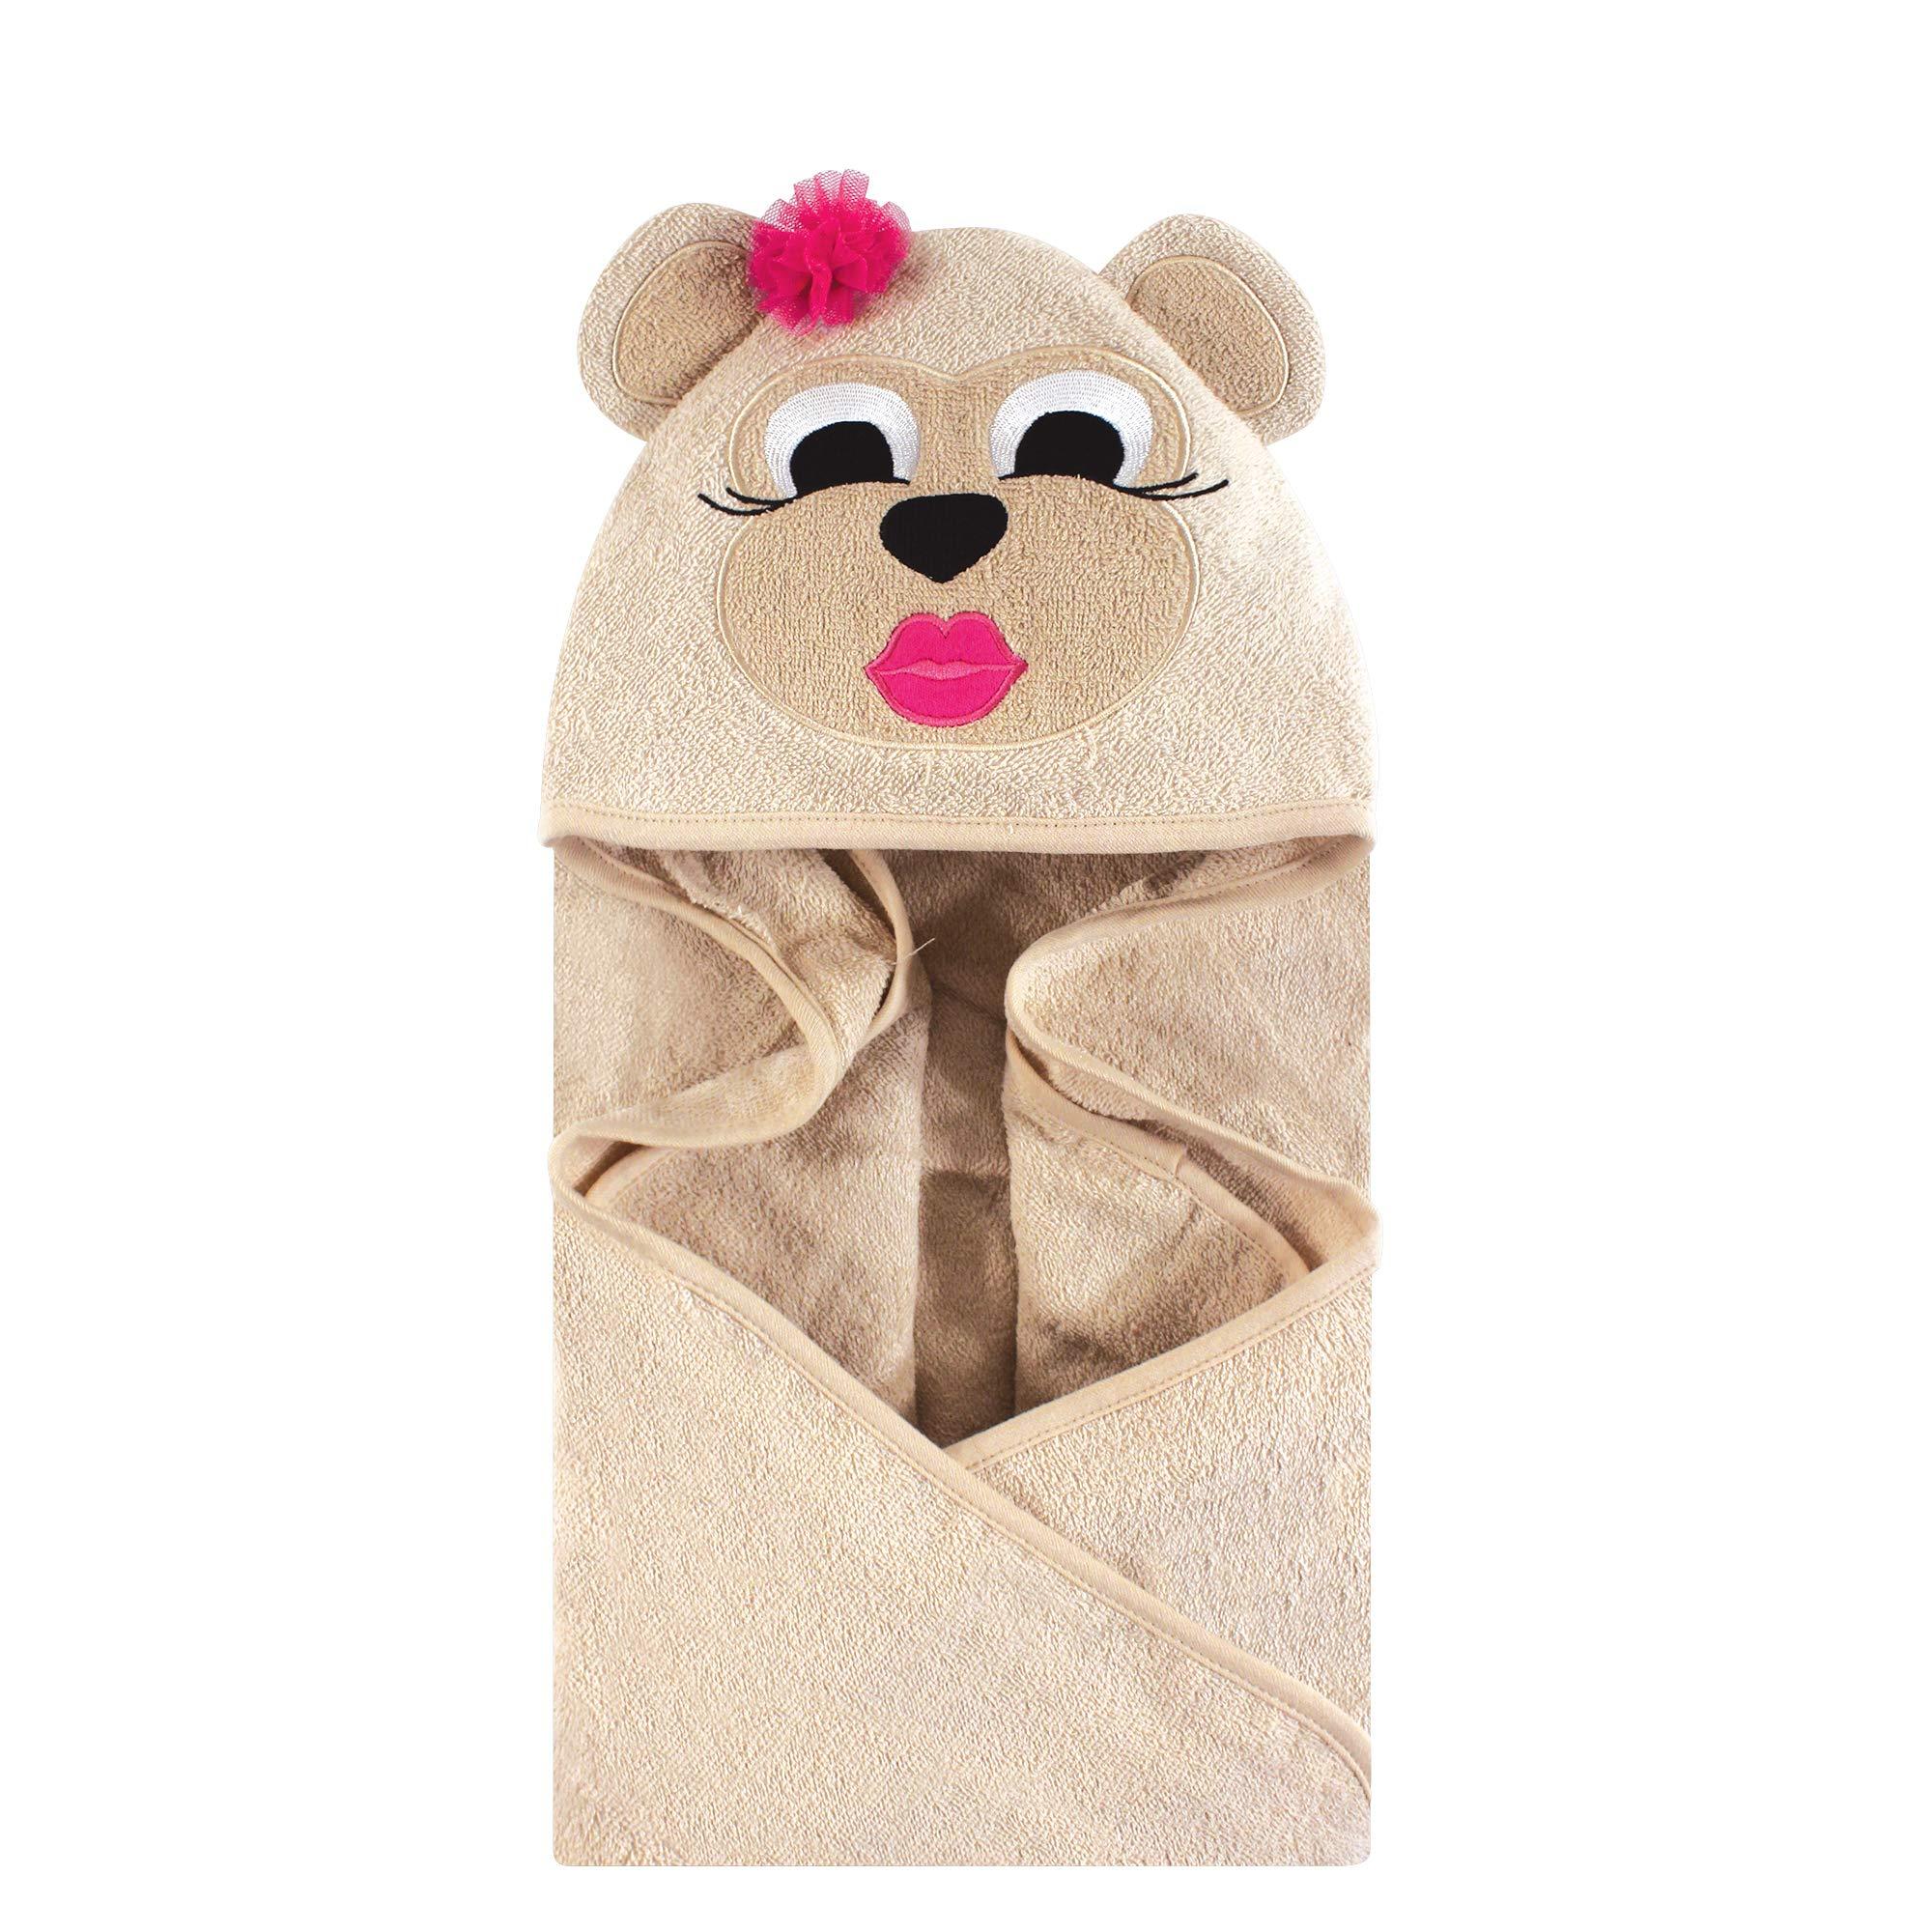 Hudson Baby Unisex Baby Cotton Animal Face Hooded Towel, Miss Monkey, One Size